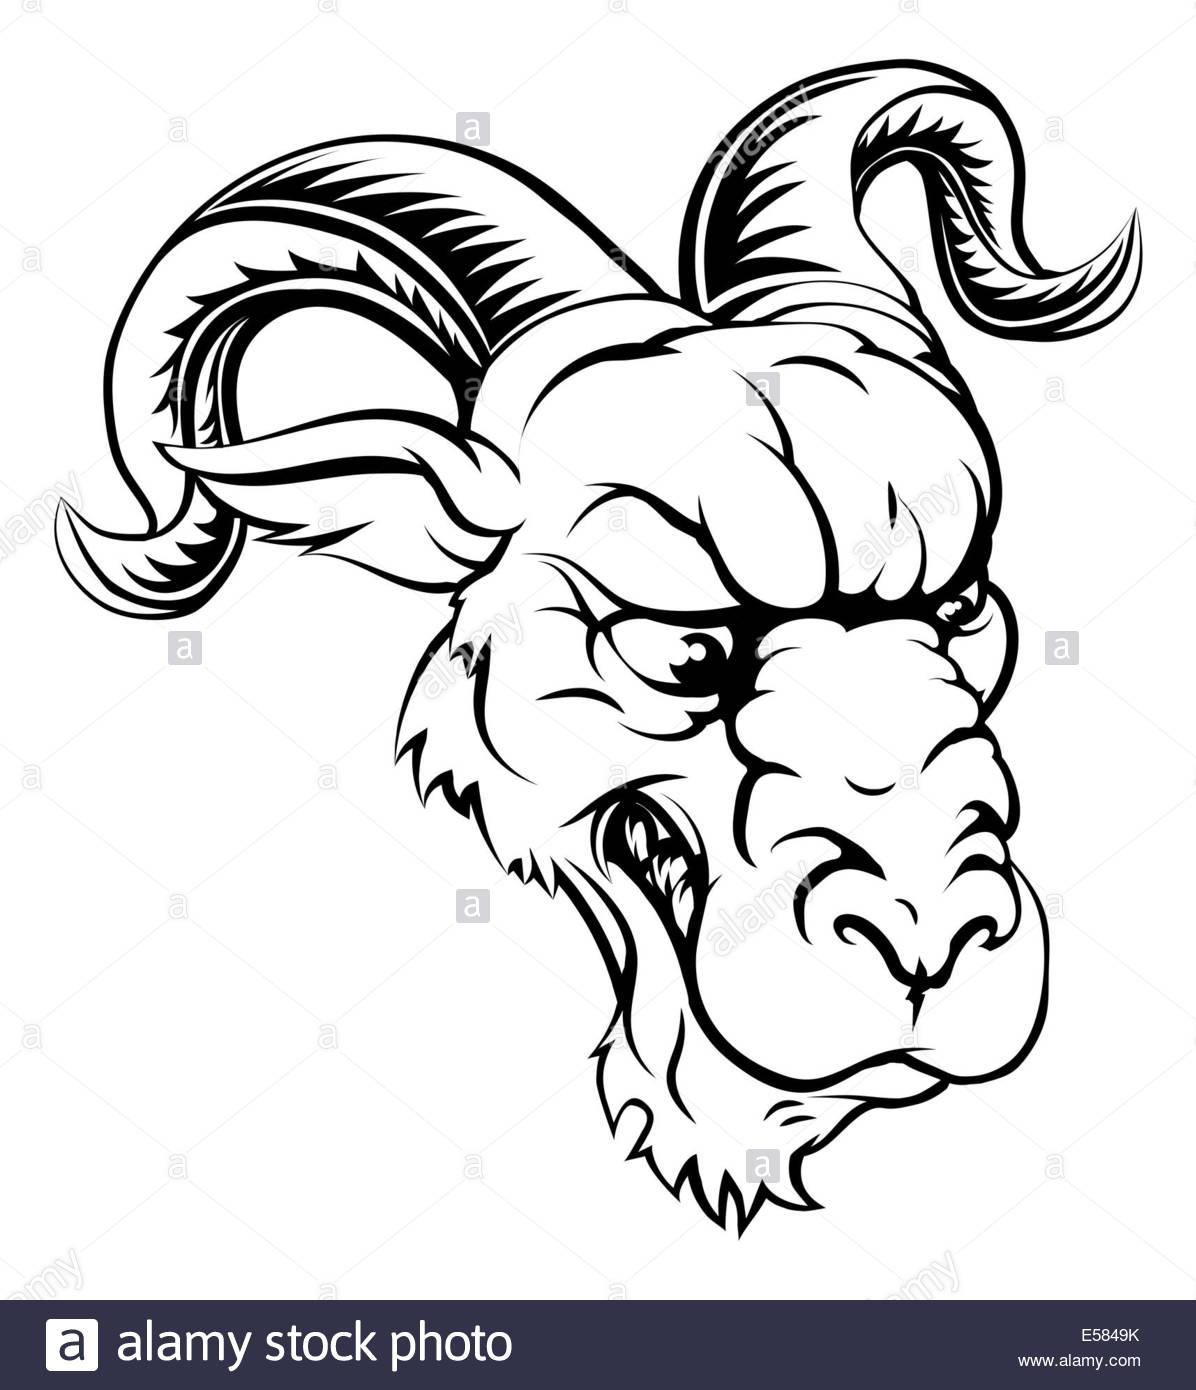 Animal Ram Drawing